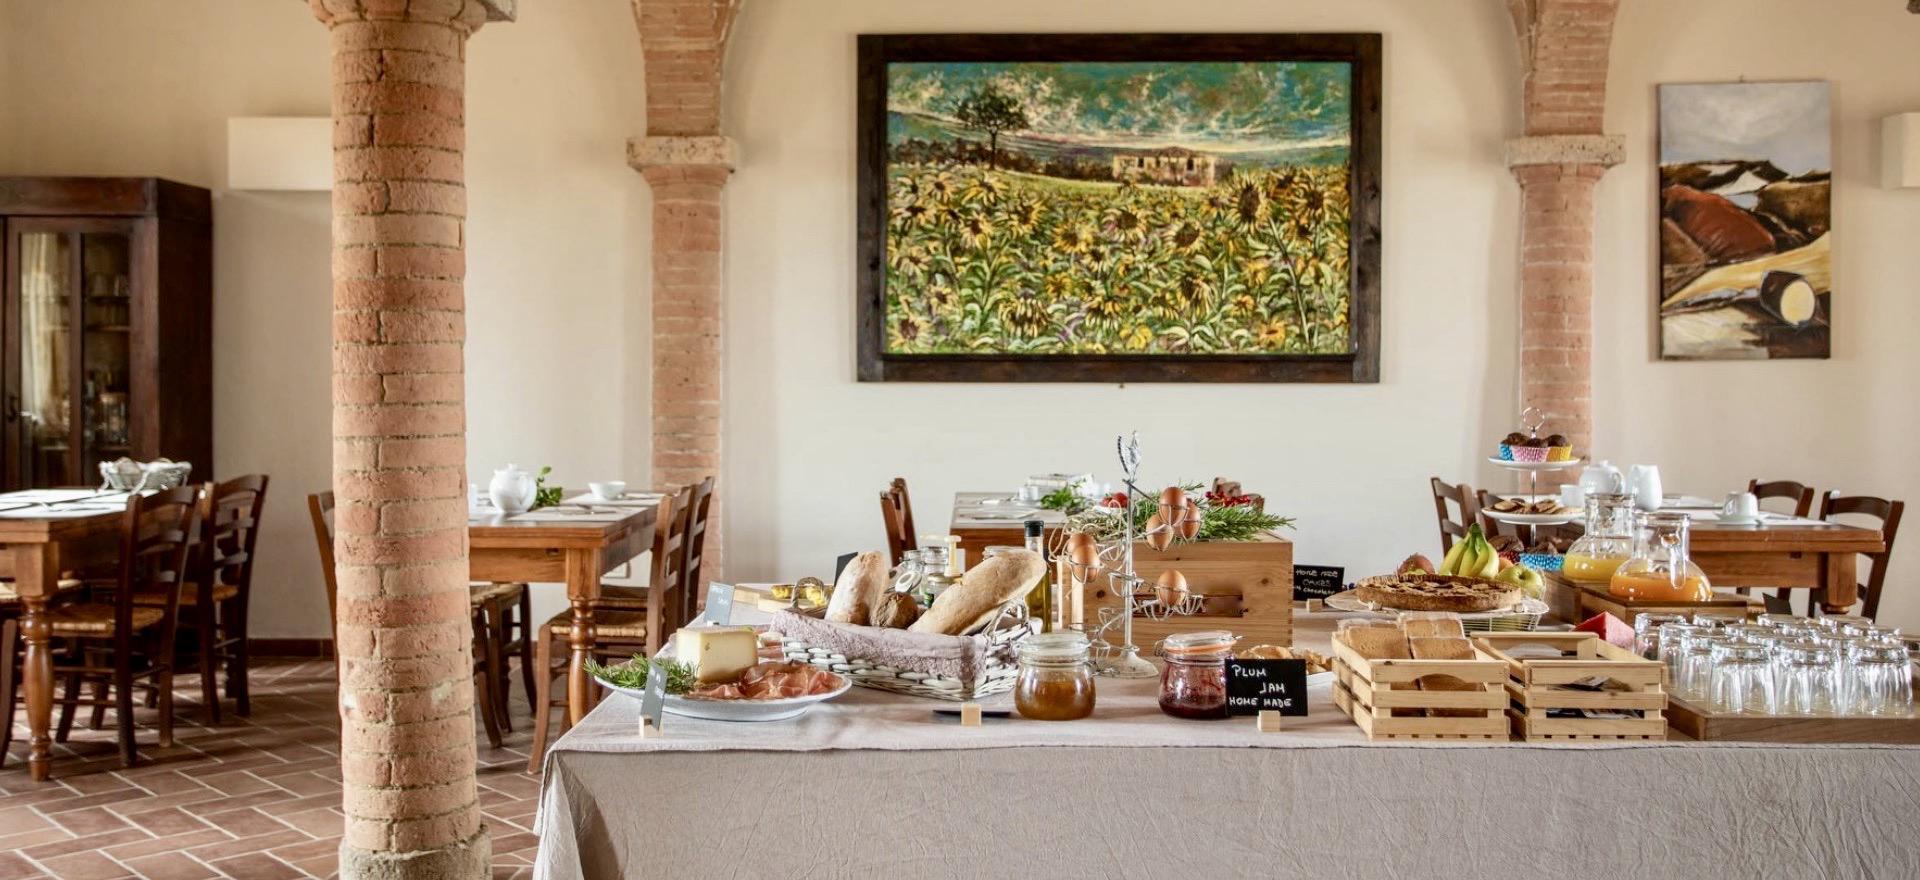 Kindvriendelijke agriturismo in Toscane met pizza avond